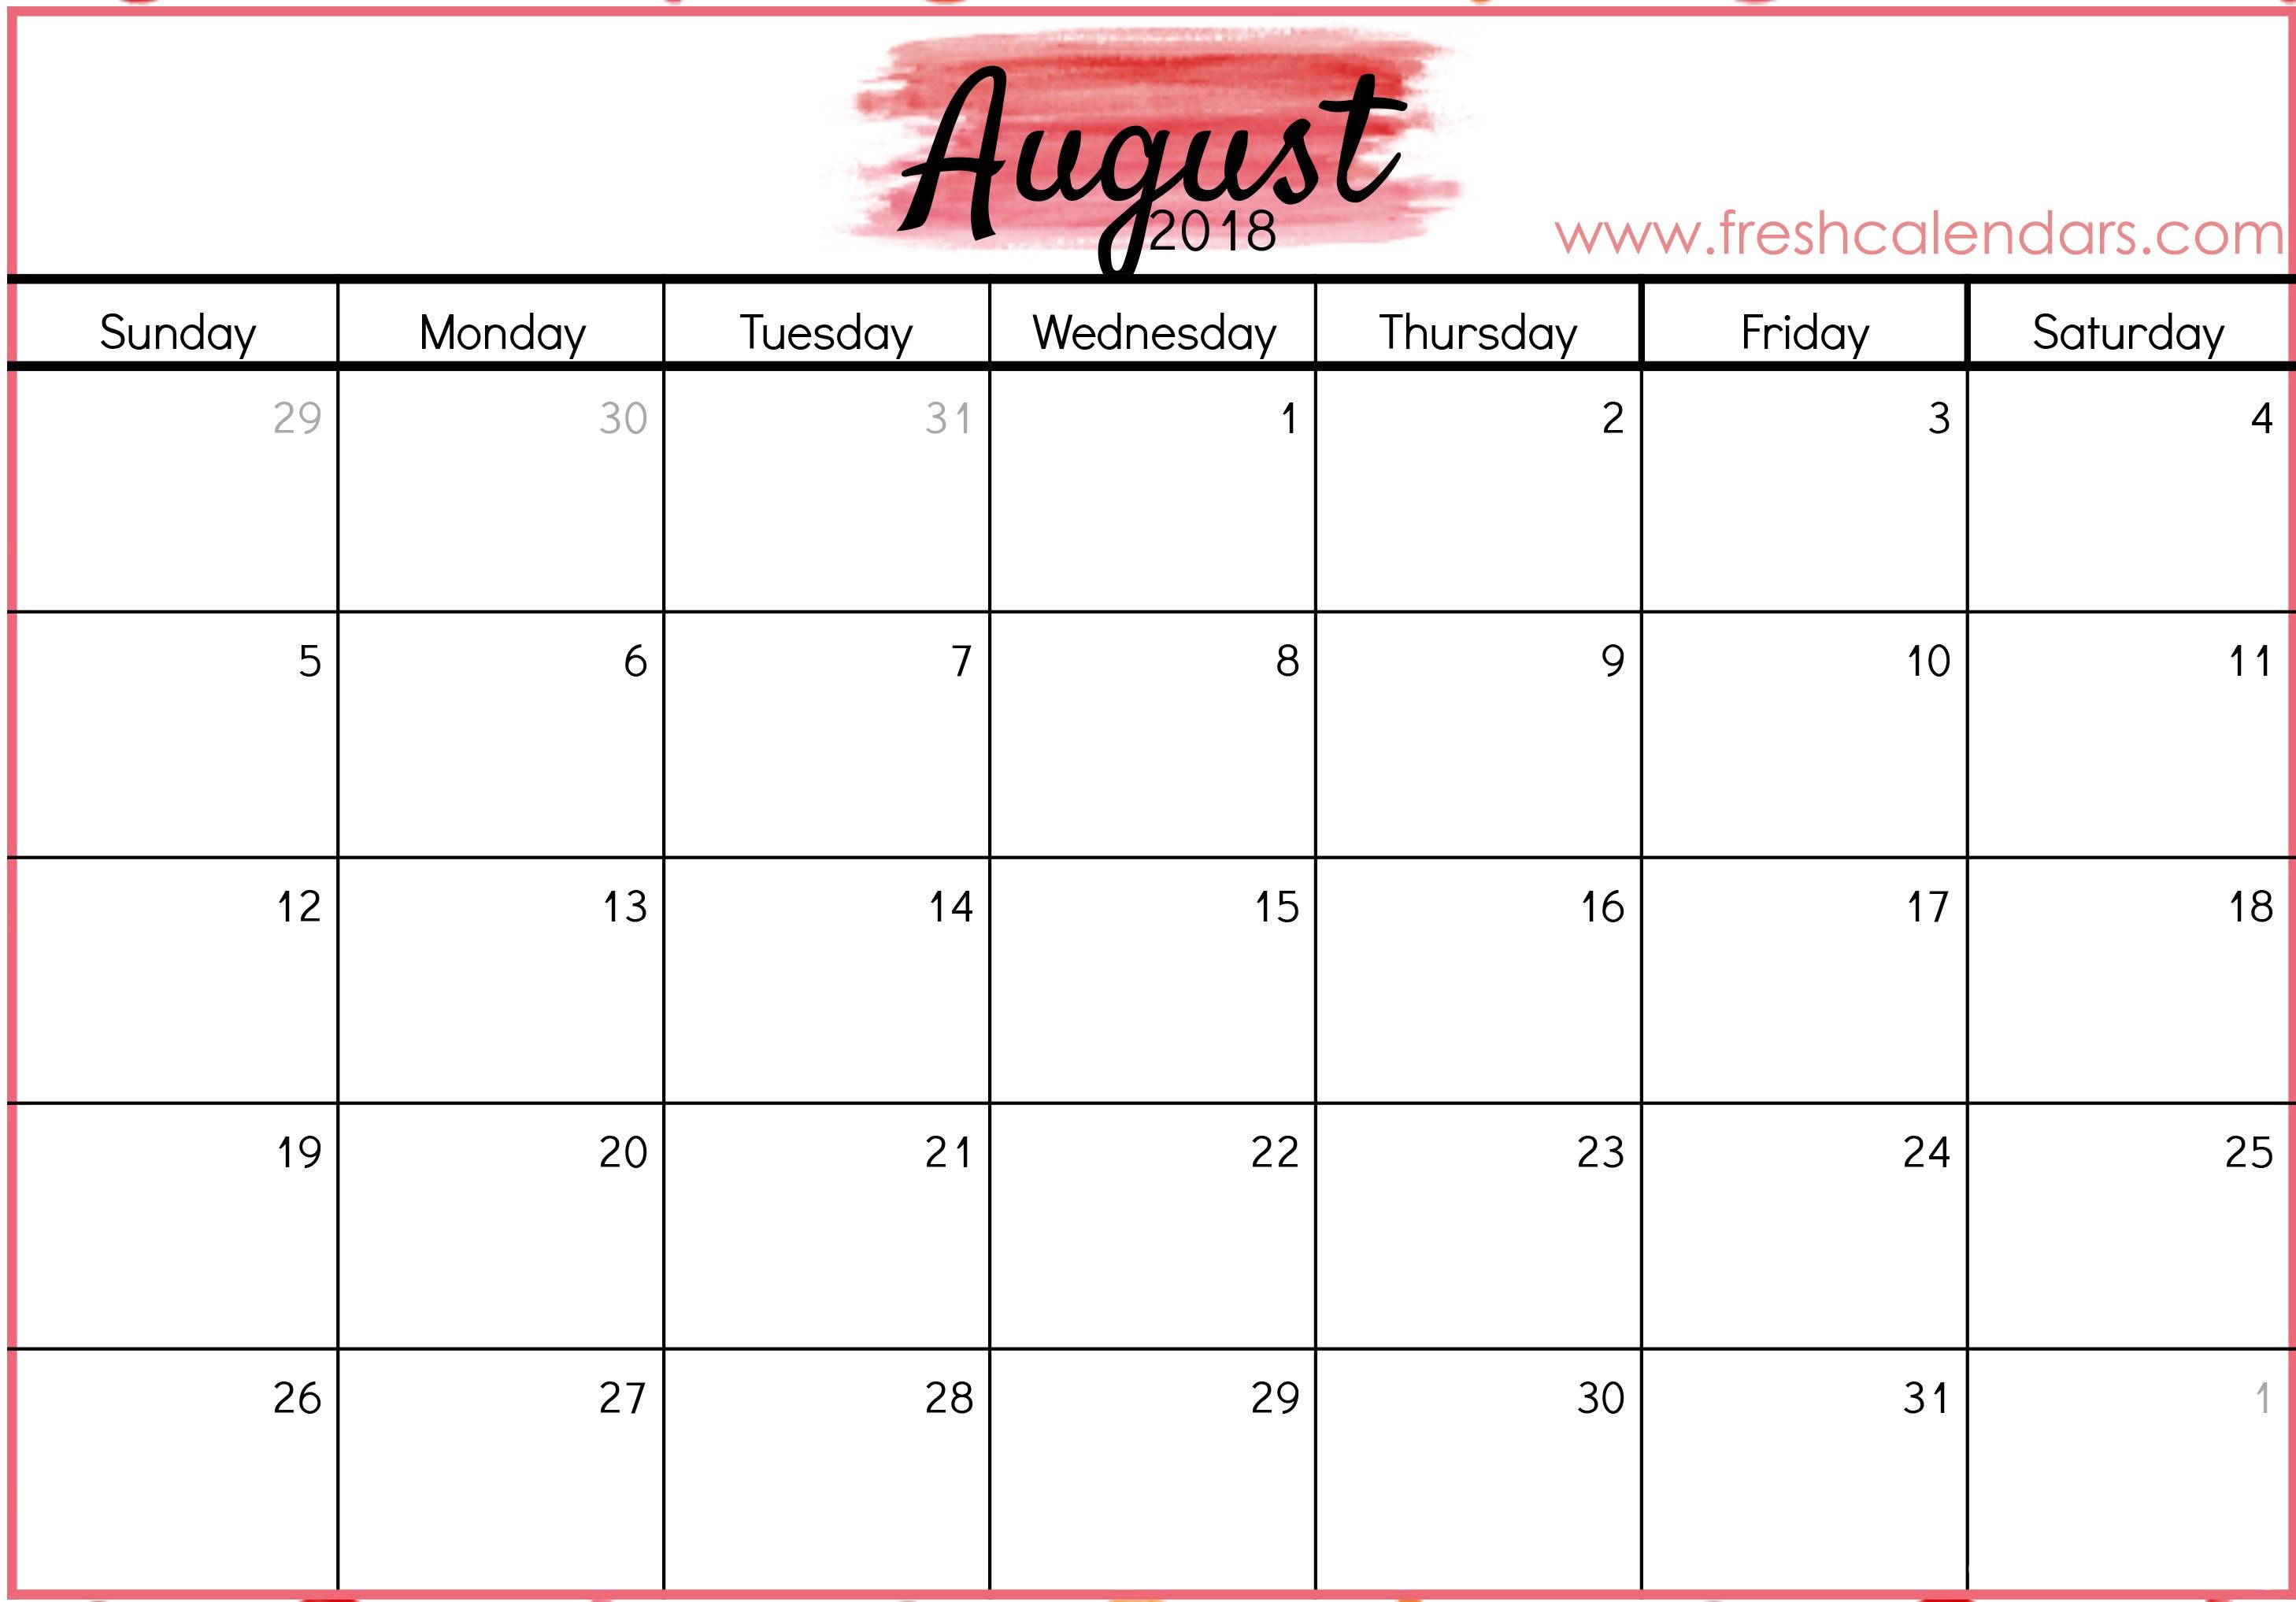 August Calendar Printable Blank August 2018 Calendar Printable Templates